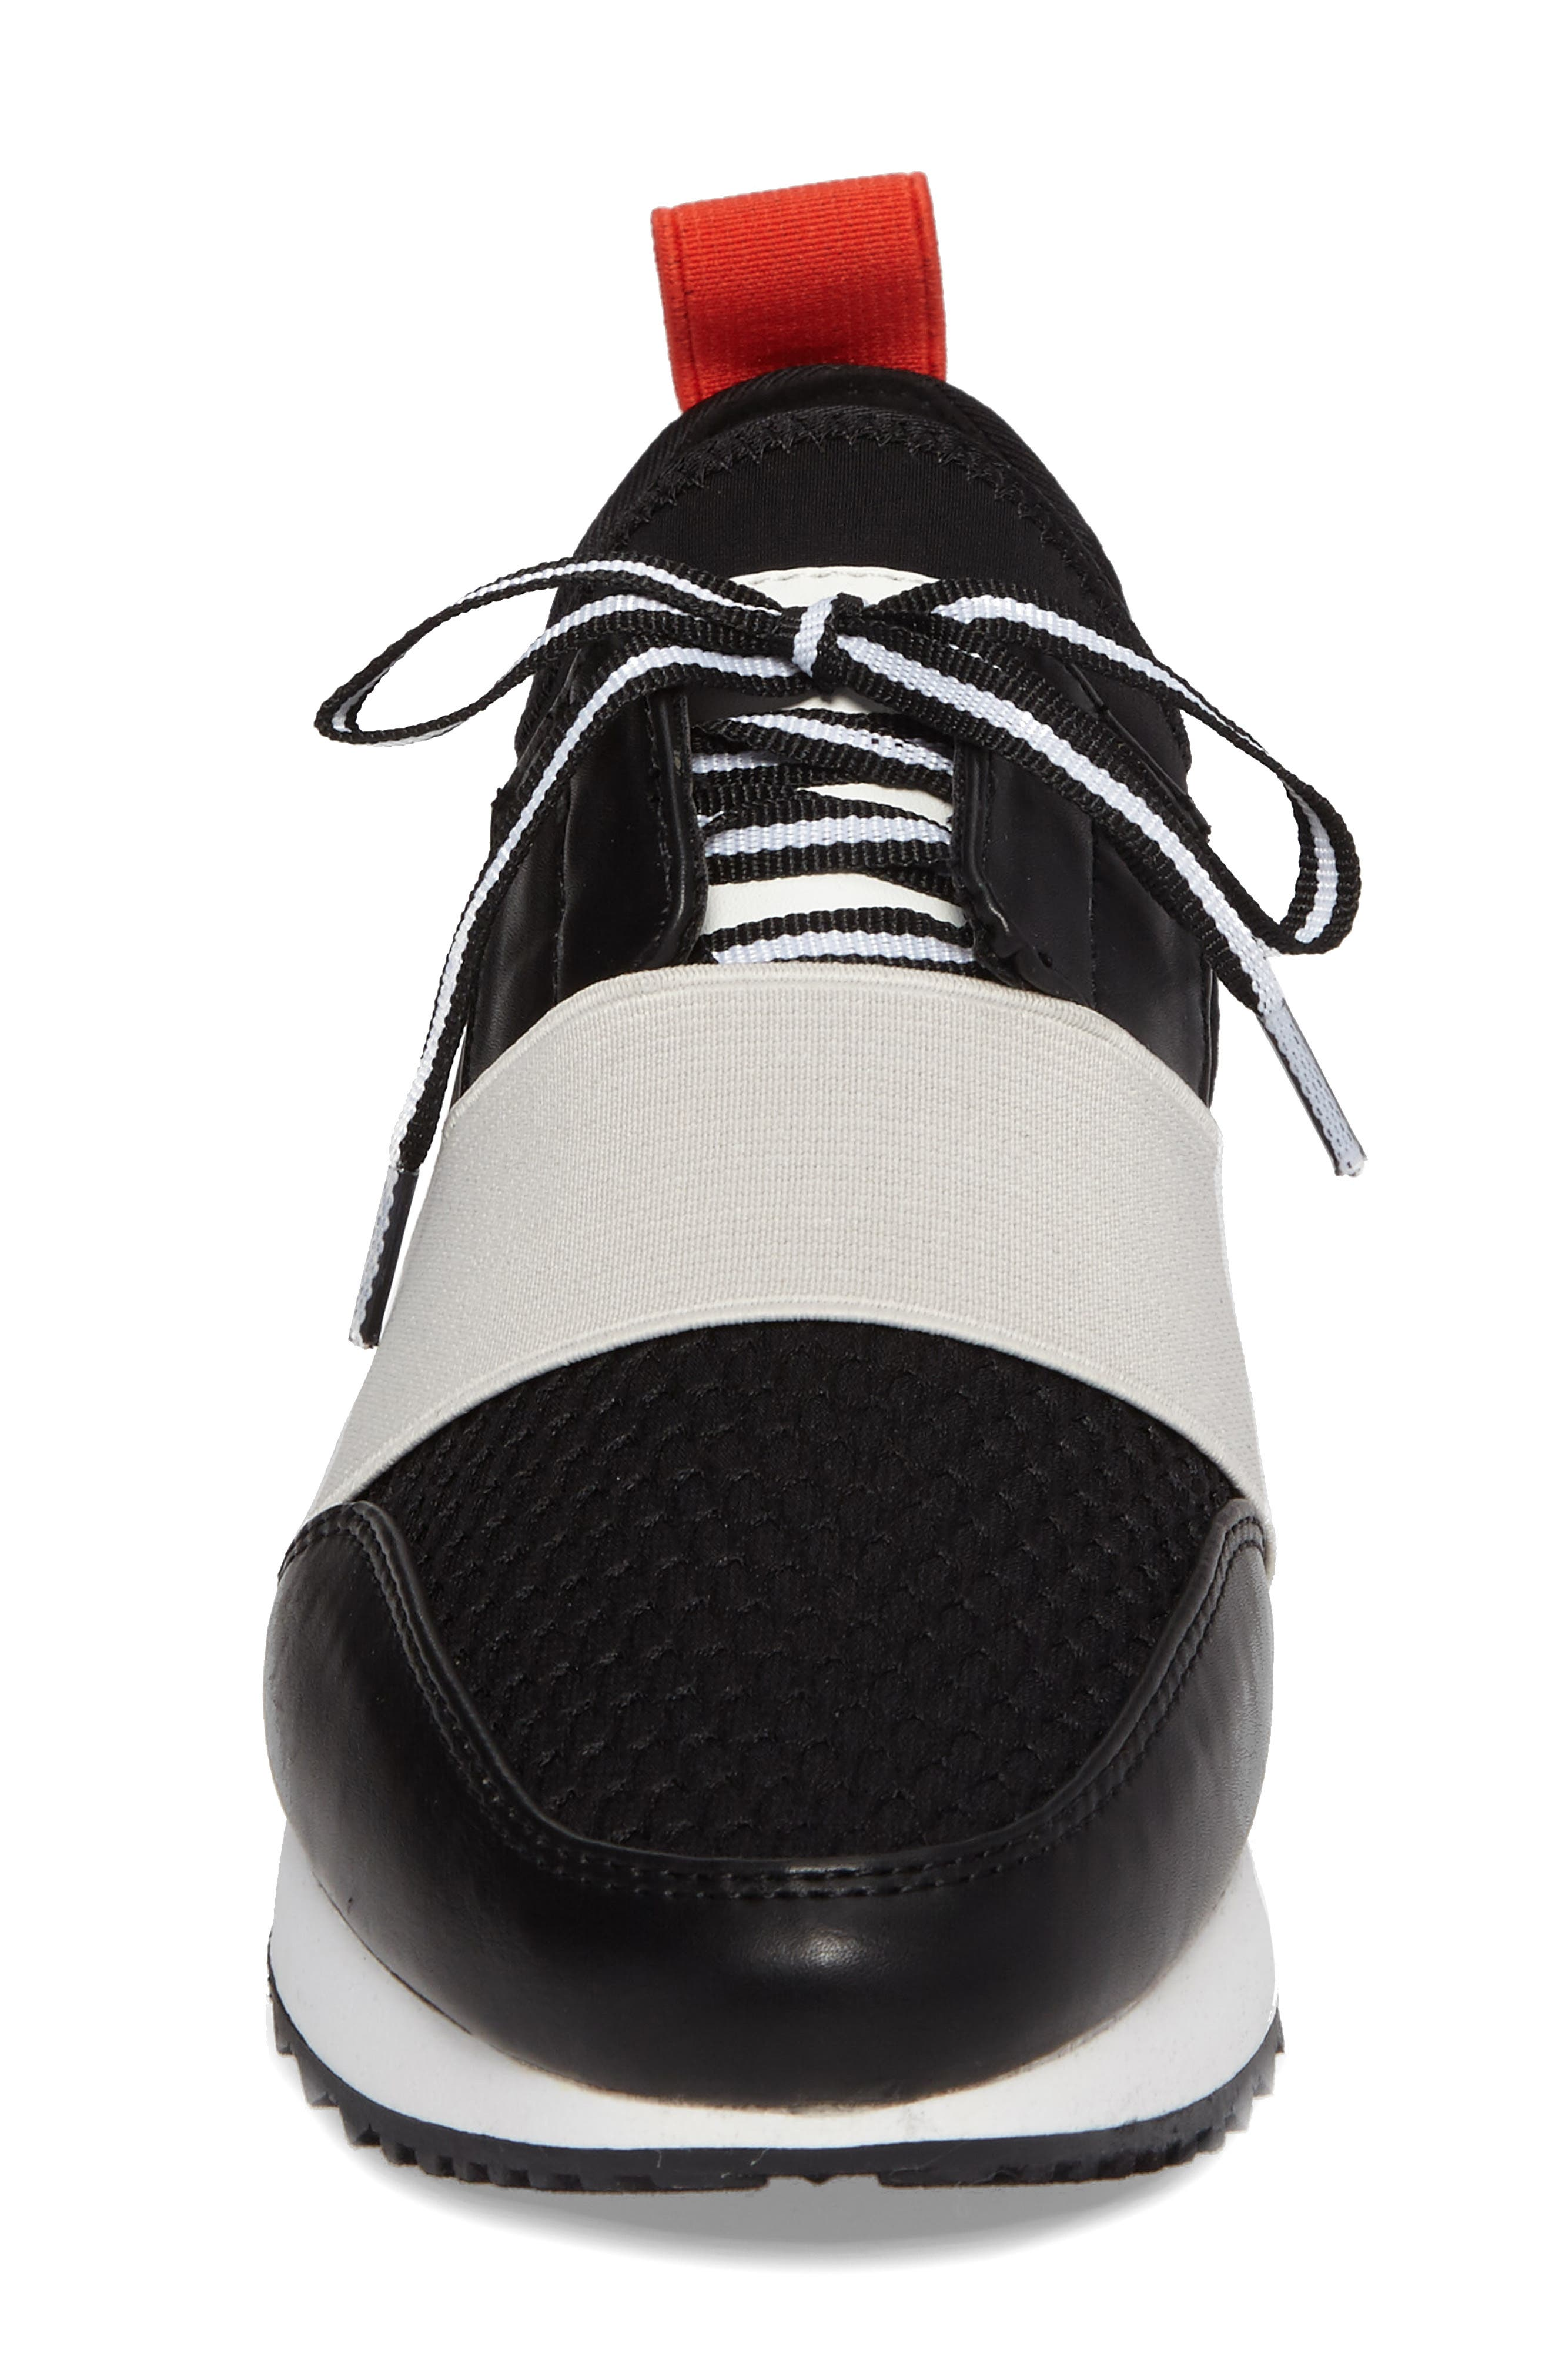 Antics Sneaker,                             Alternate thumbnail 4, color,                             015